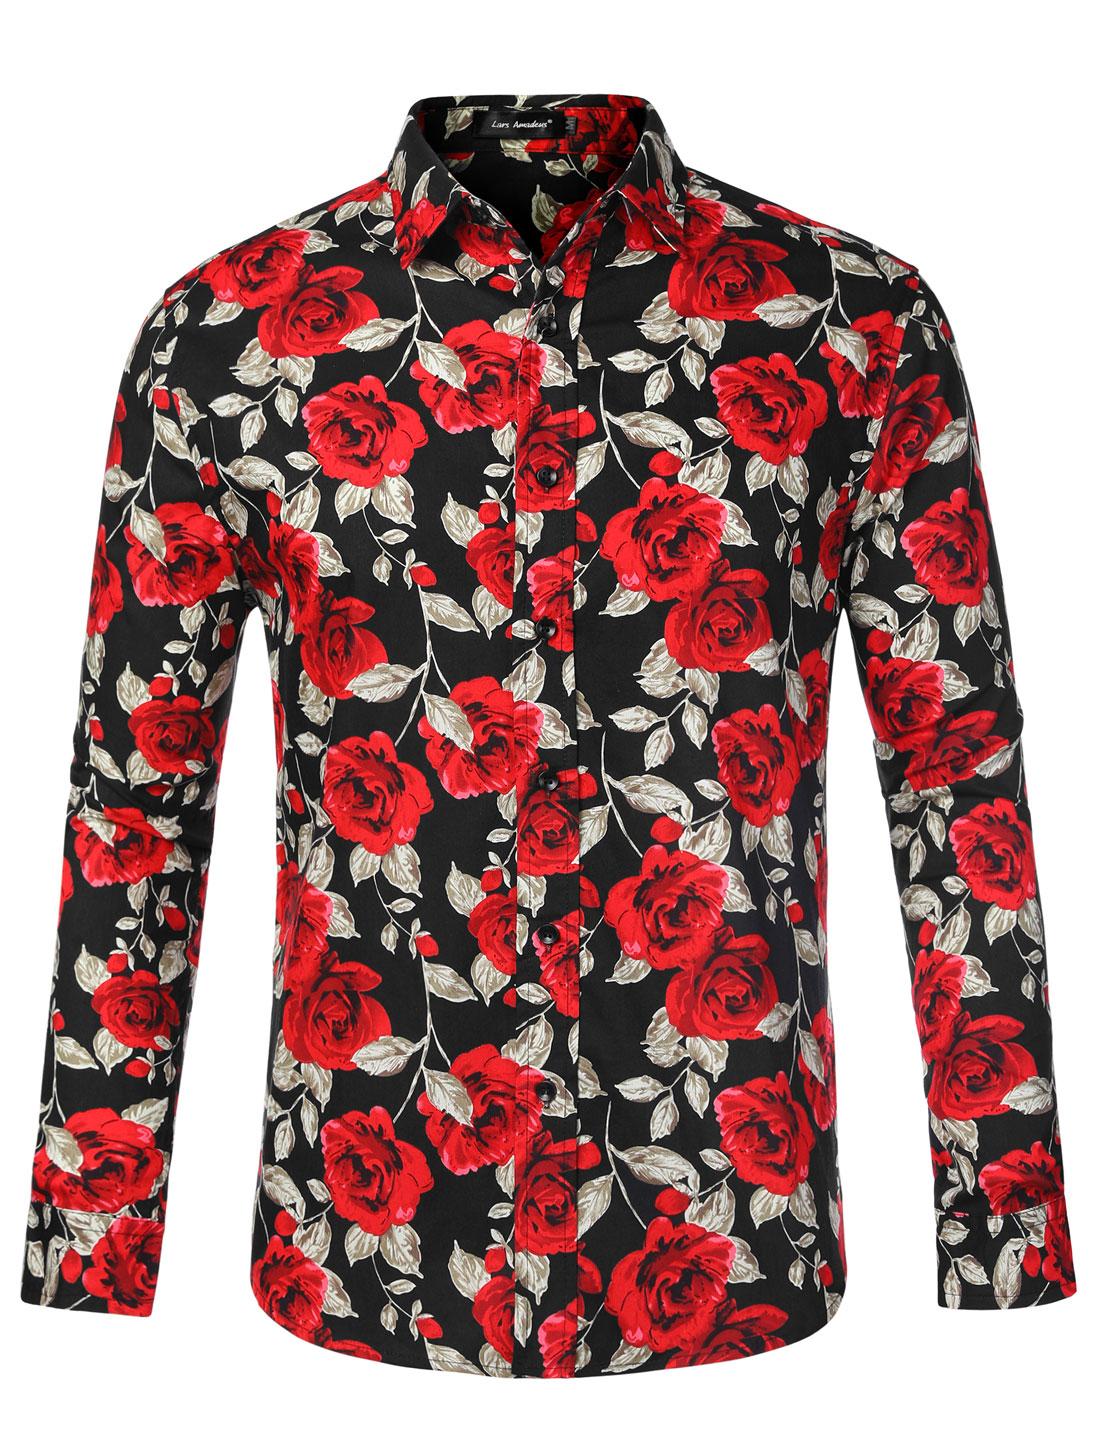 Men Floral Button Down Hawaiian Palm Flower Printed Shirt Black Rose L